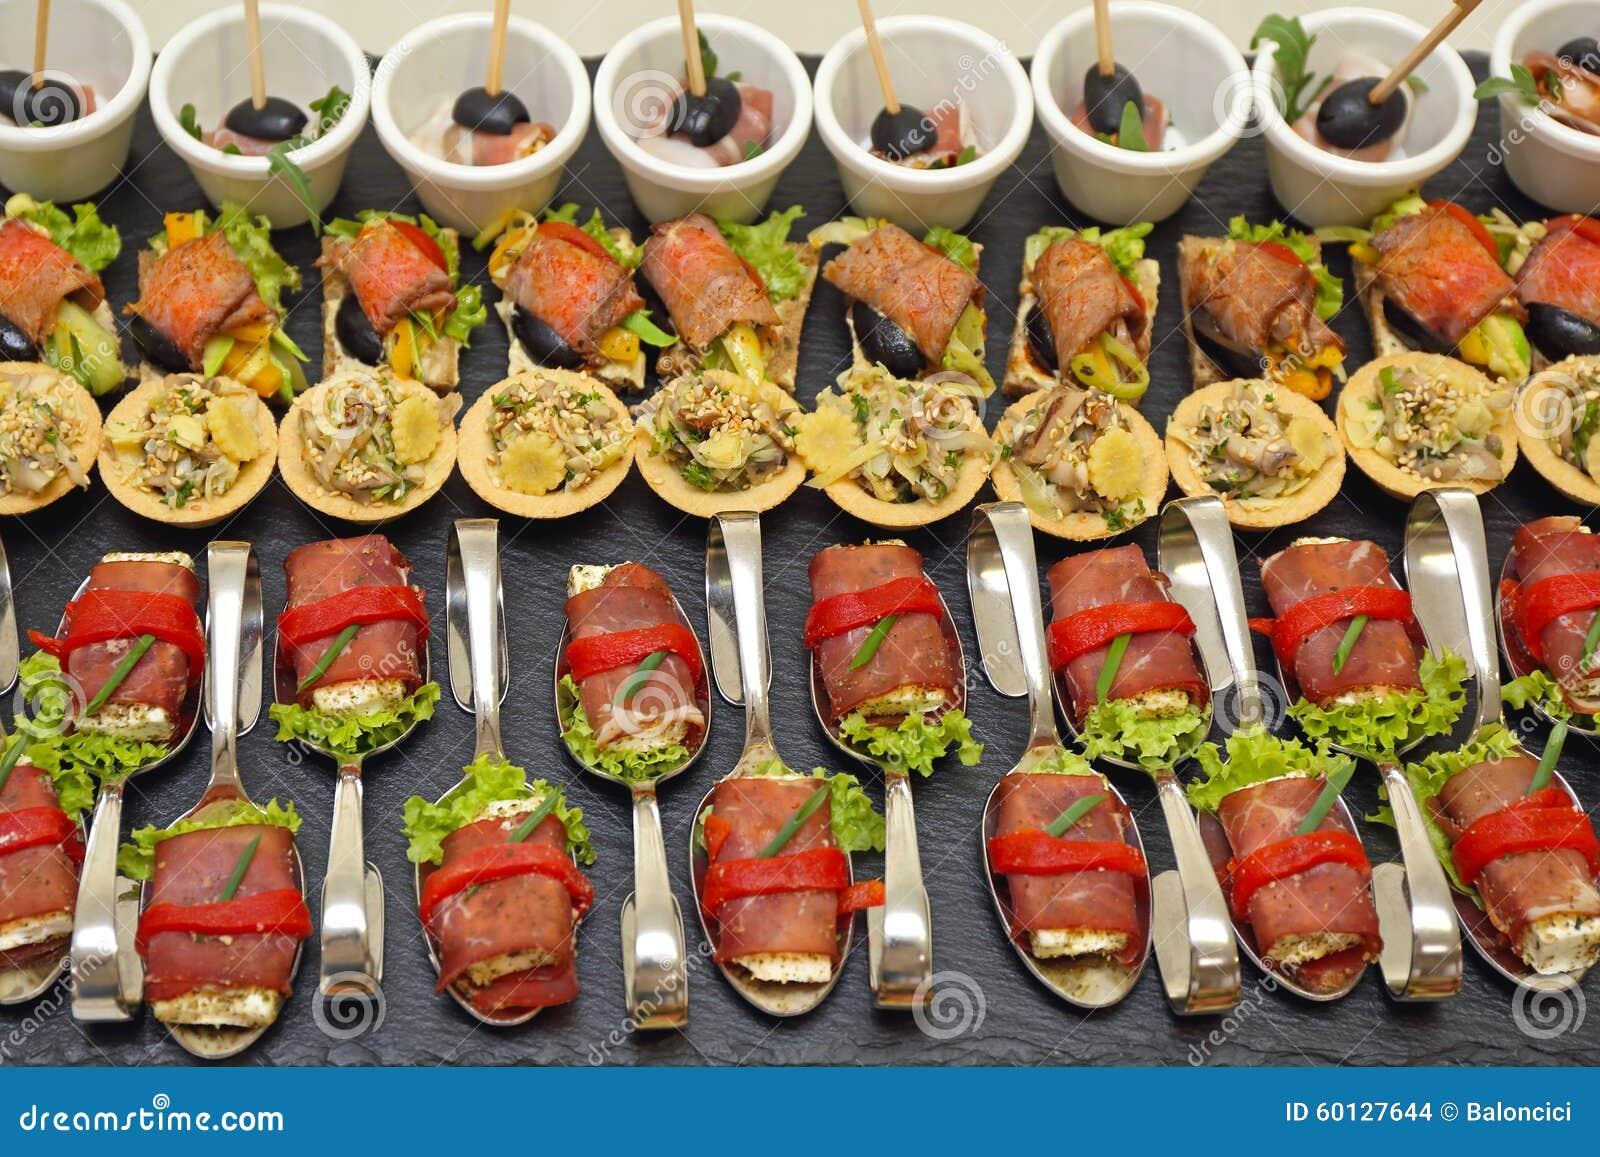 modern cuisine stock images